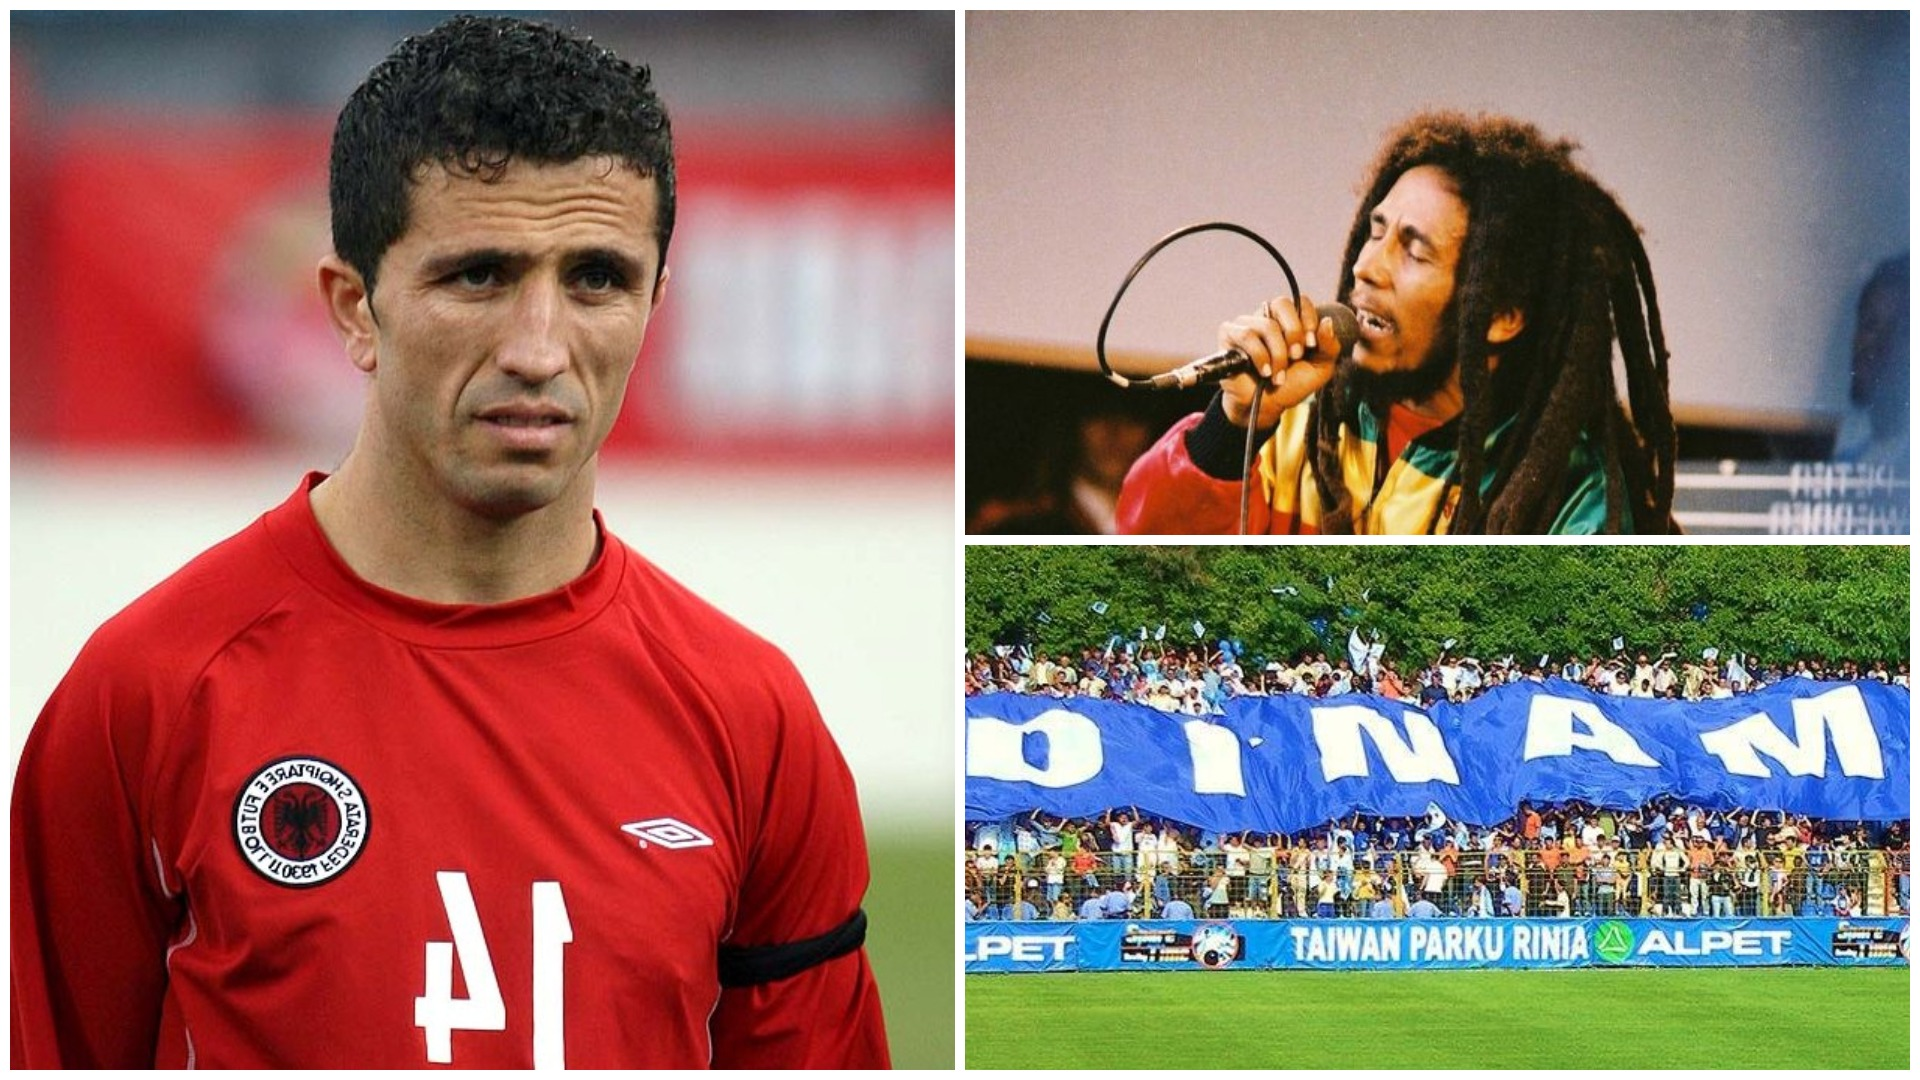 """Bob Marley"" shqiptar: Mund të financoj Dinamon, dihet pse na iku Rashica"